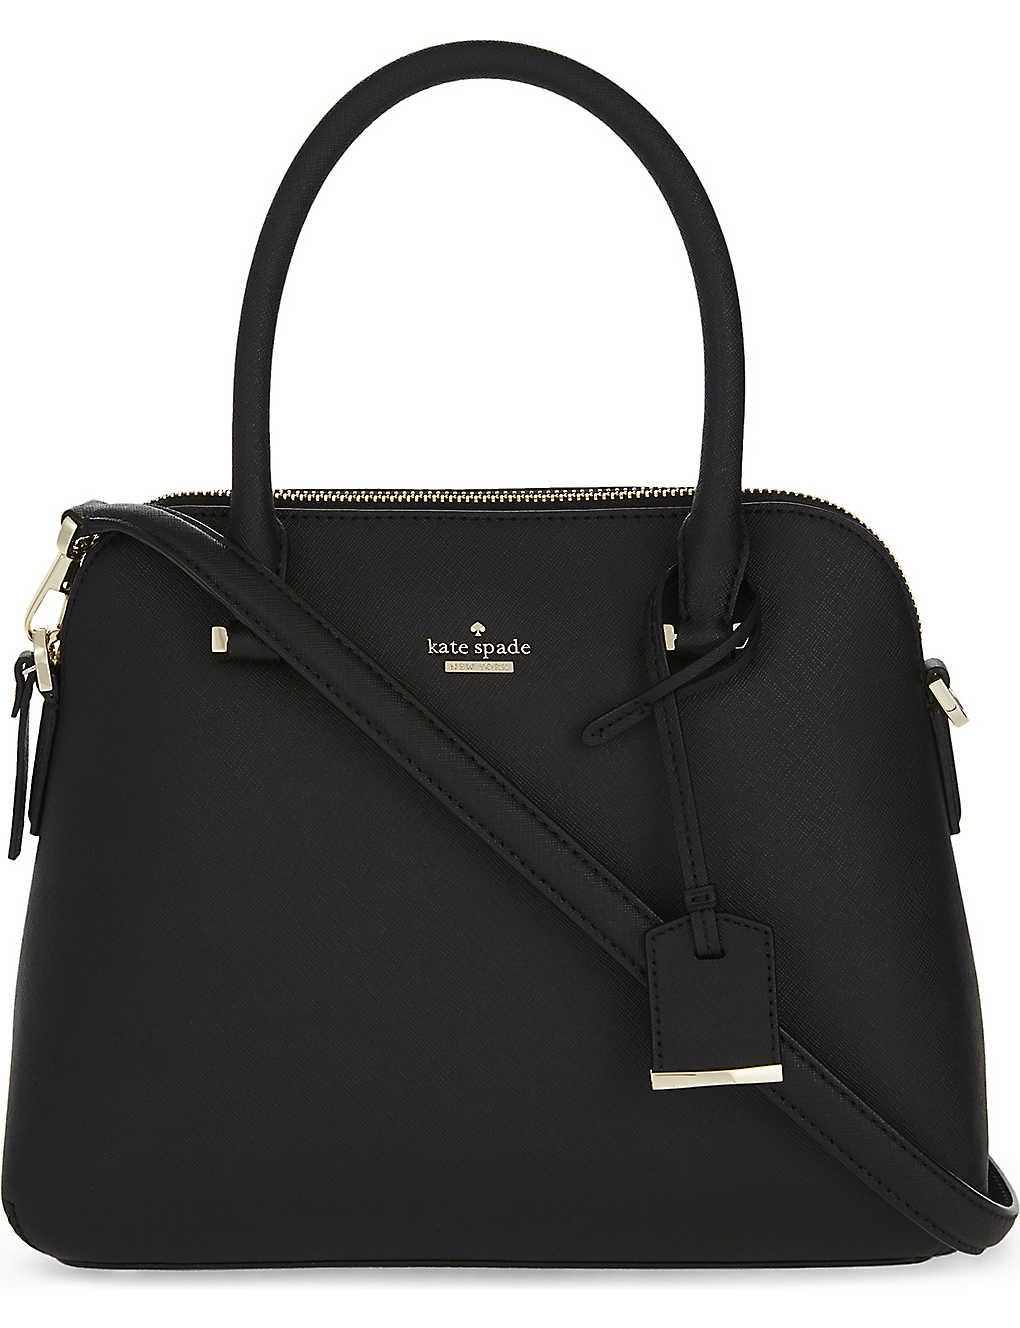 c24b71035bb KATE SPADE NEW YORK - Cameron Street Maise leather shoulder bag ...